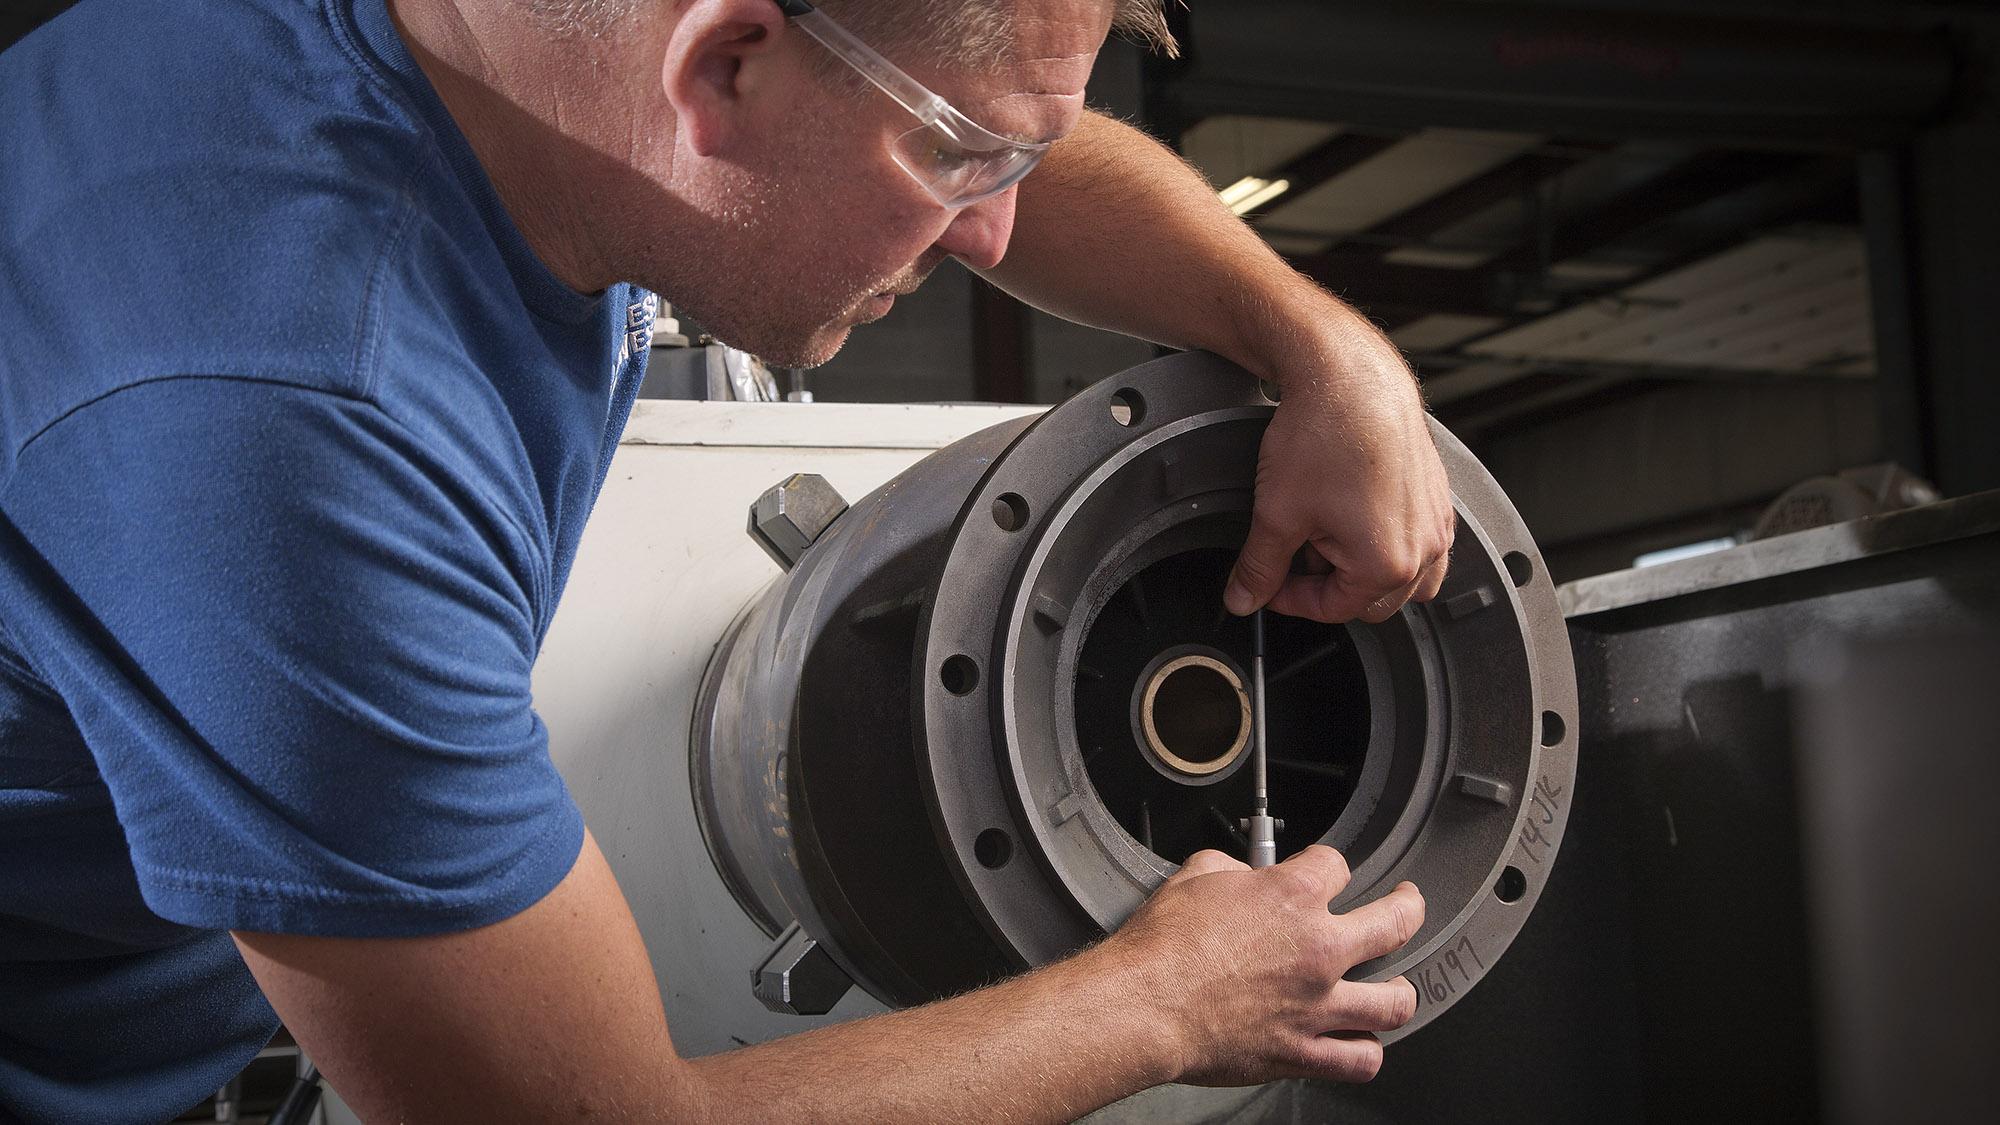 Pumps maintenance and services